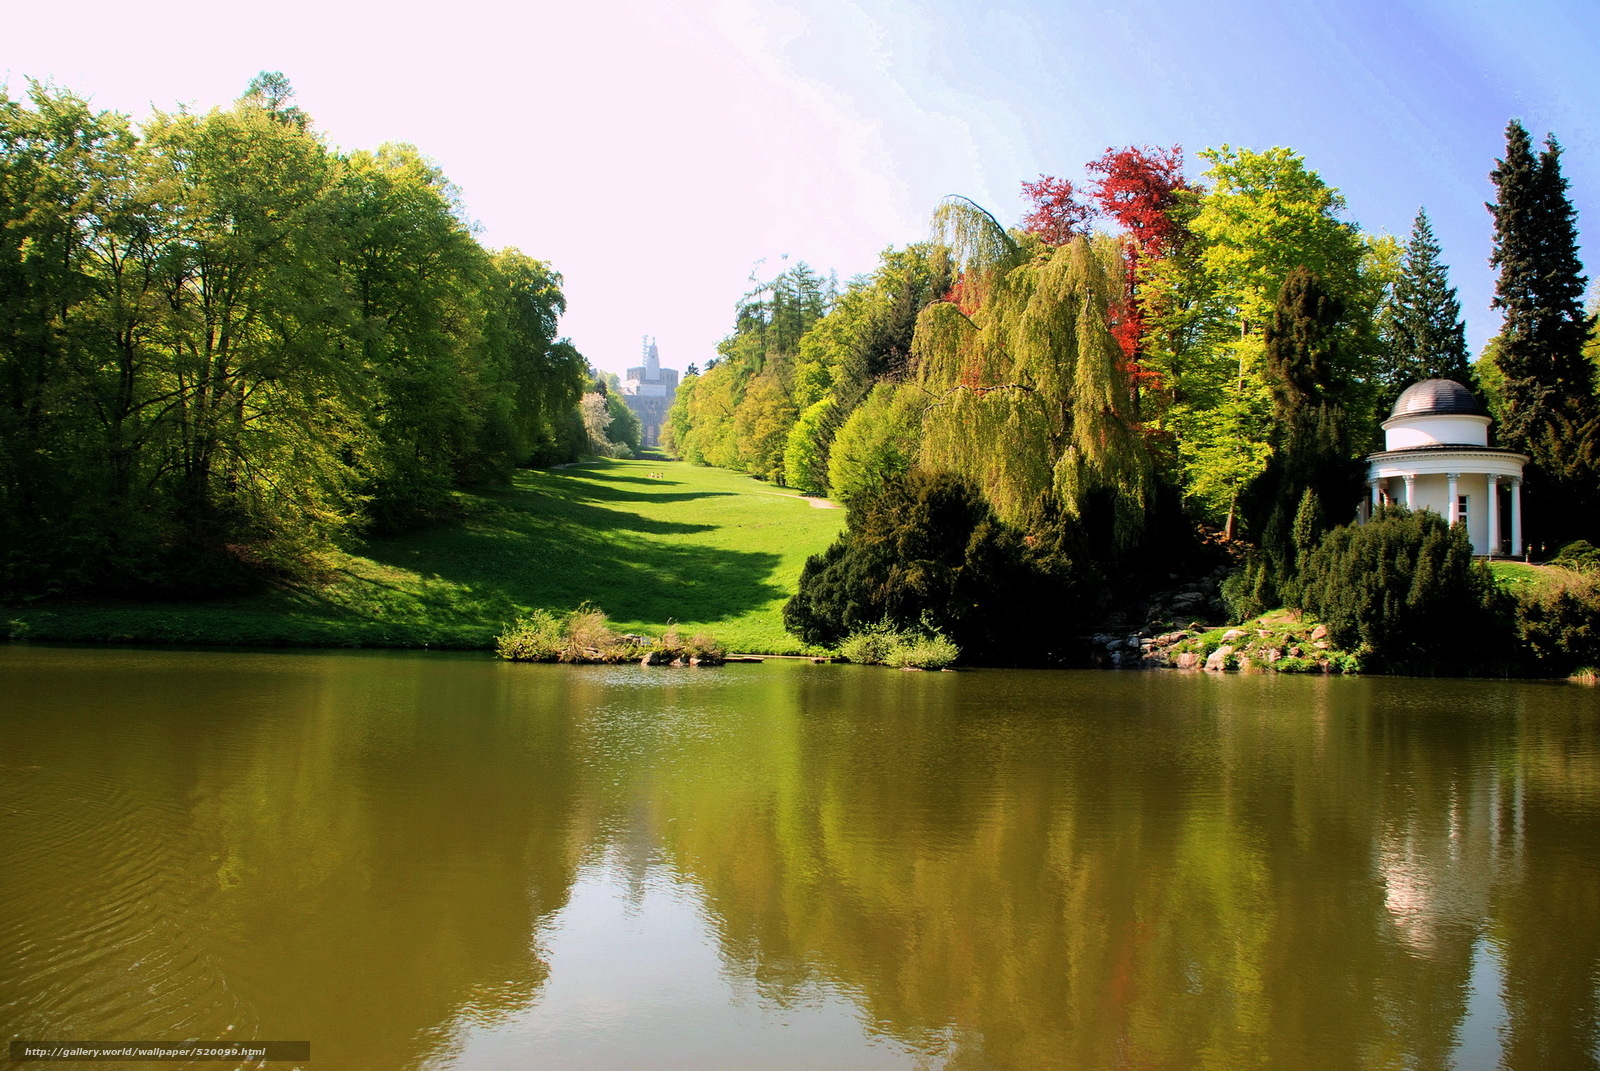 Wald, sommer, fluss, greens, wiese